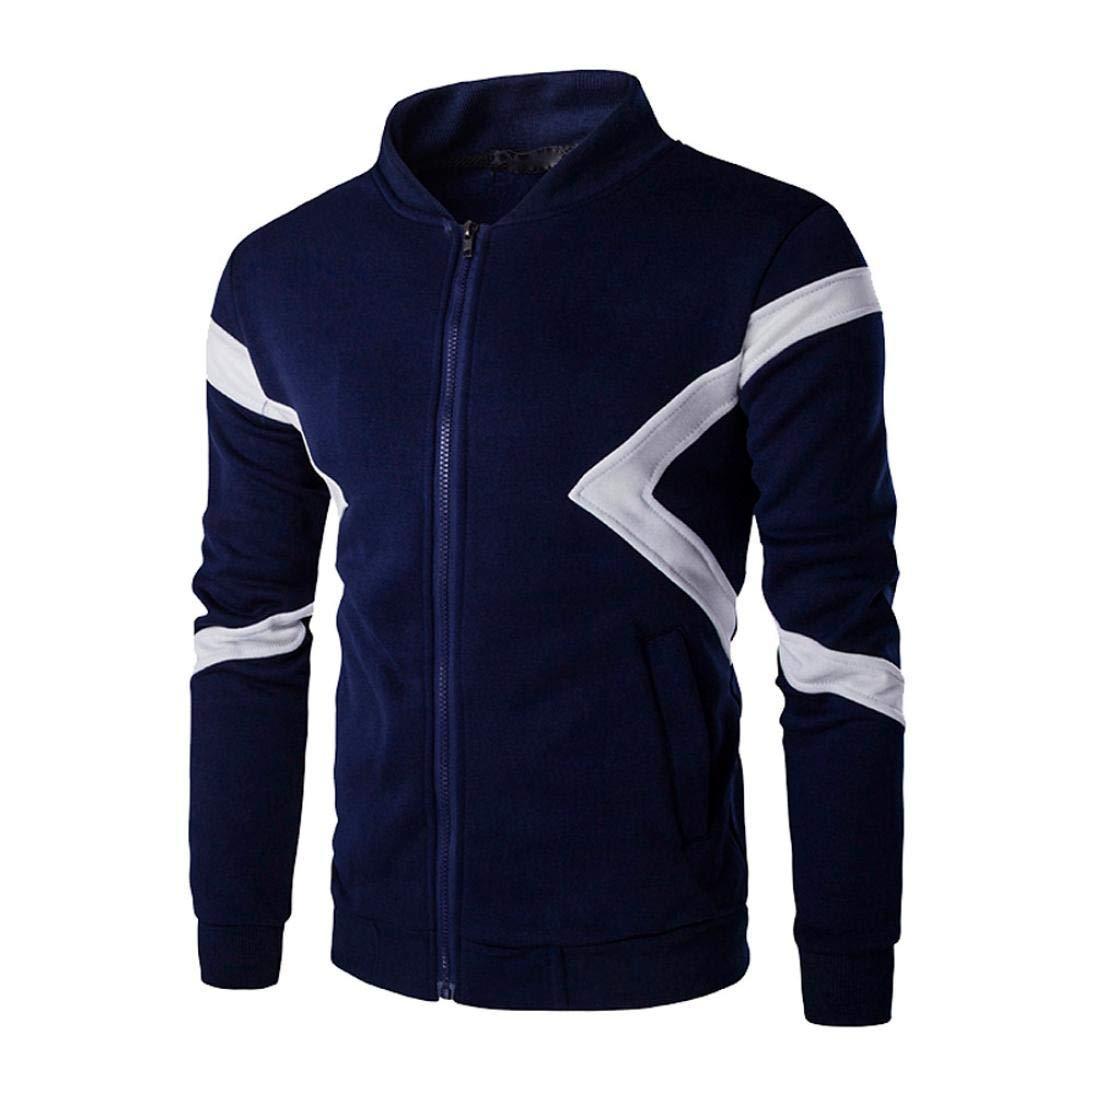 kaifongfu Men Tops,Long Sleeve Men's Pathwork Blouse Color Sweatshirt Top Tee Outwear(Navy,XL)